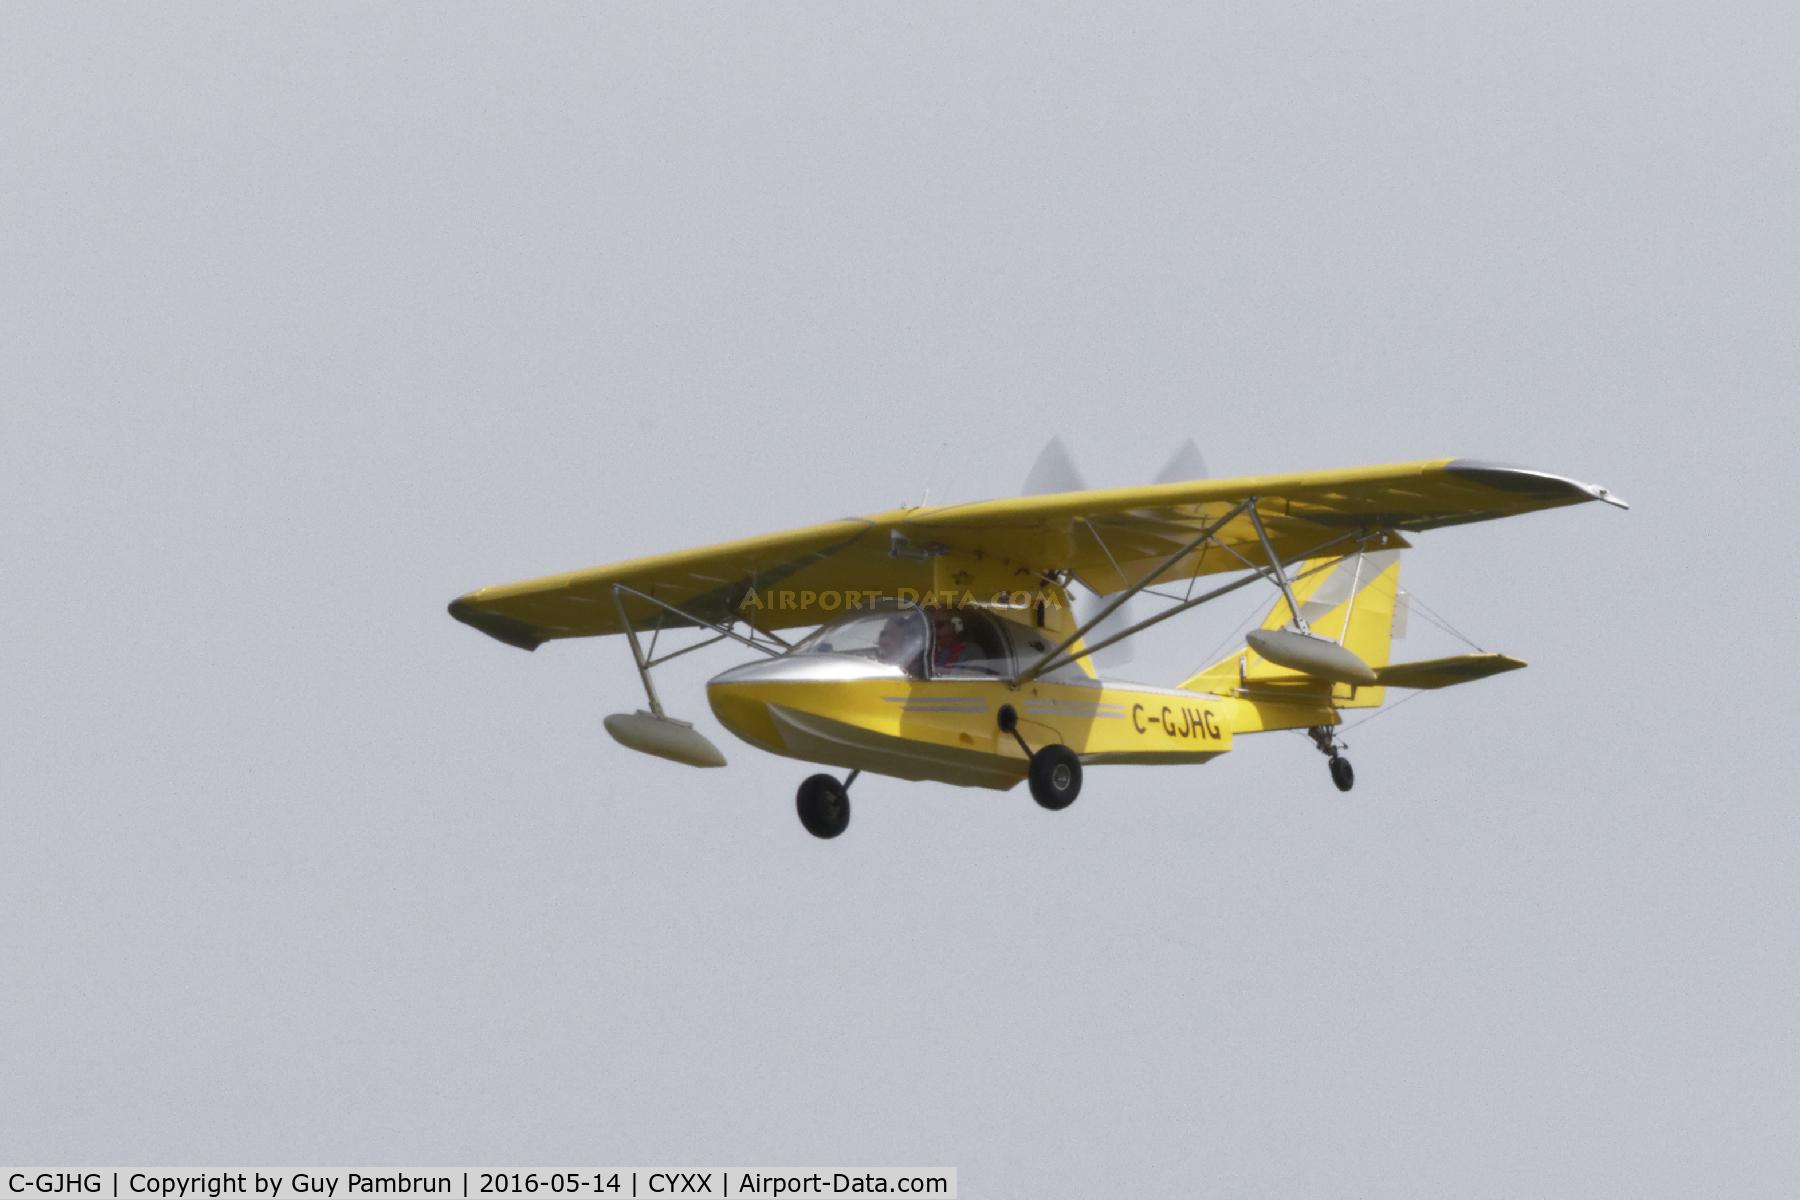 Aircraft C-GJHG (2002 Progressive Aerodyne SEAREY C/N 1DK265C ...